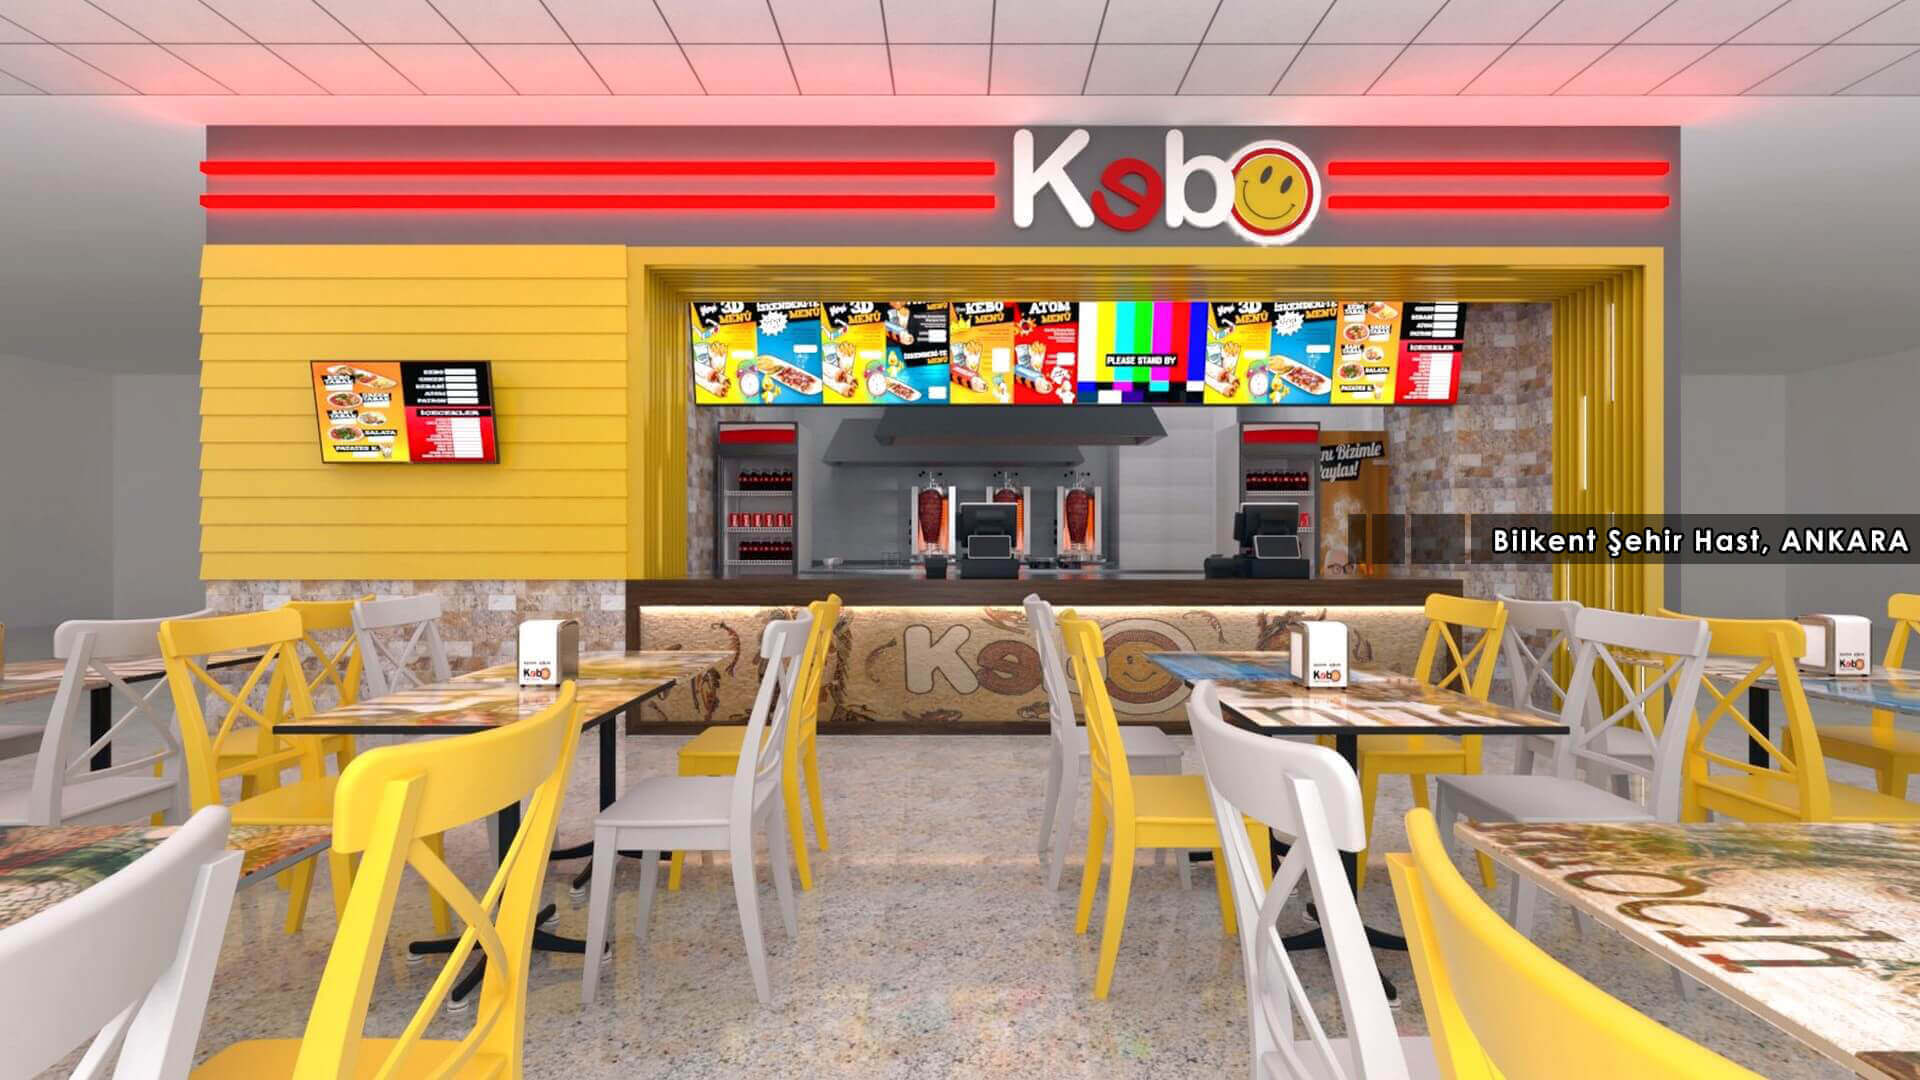 restaurant interior design 2127 Kebo 2018 Restaurants